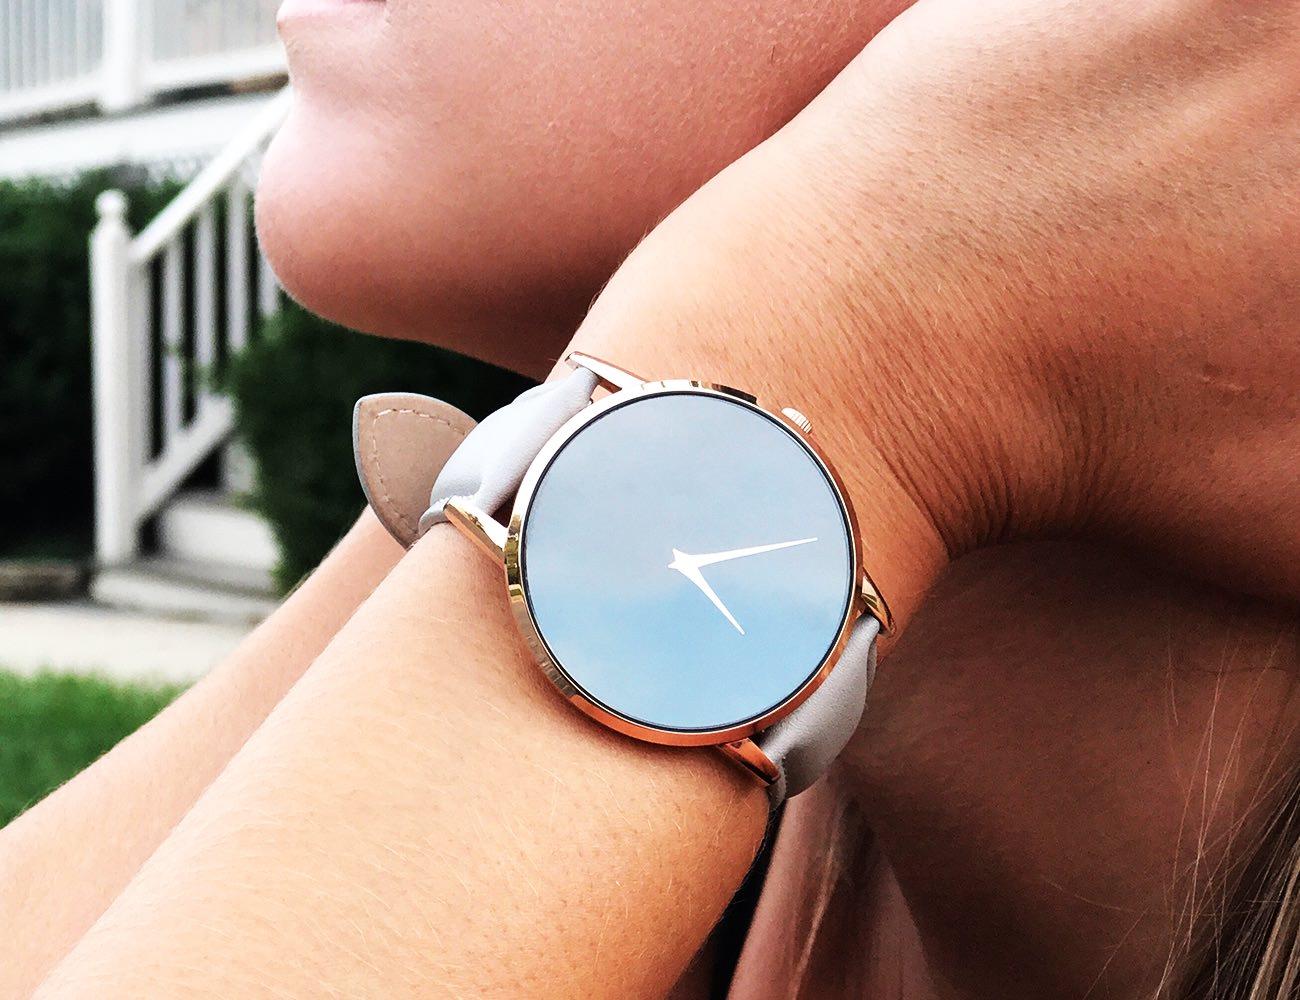 Teleio Bold Swiss Movement Watches